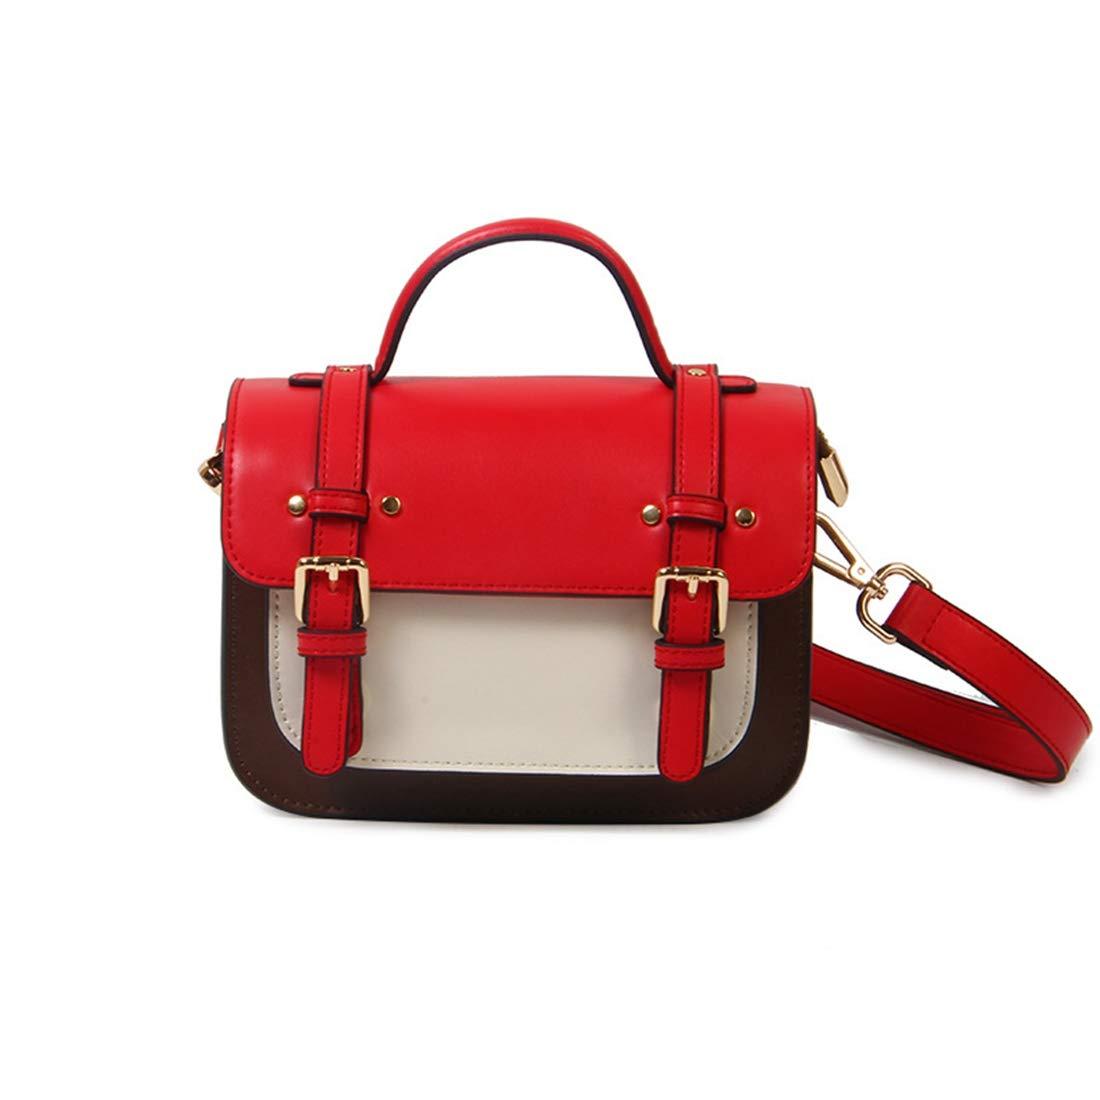 RABILTY Simple Retro Belt Buckle Stitching Hit Color Square Leather Shoulder Bag Messenger Bag Color : Red